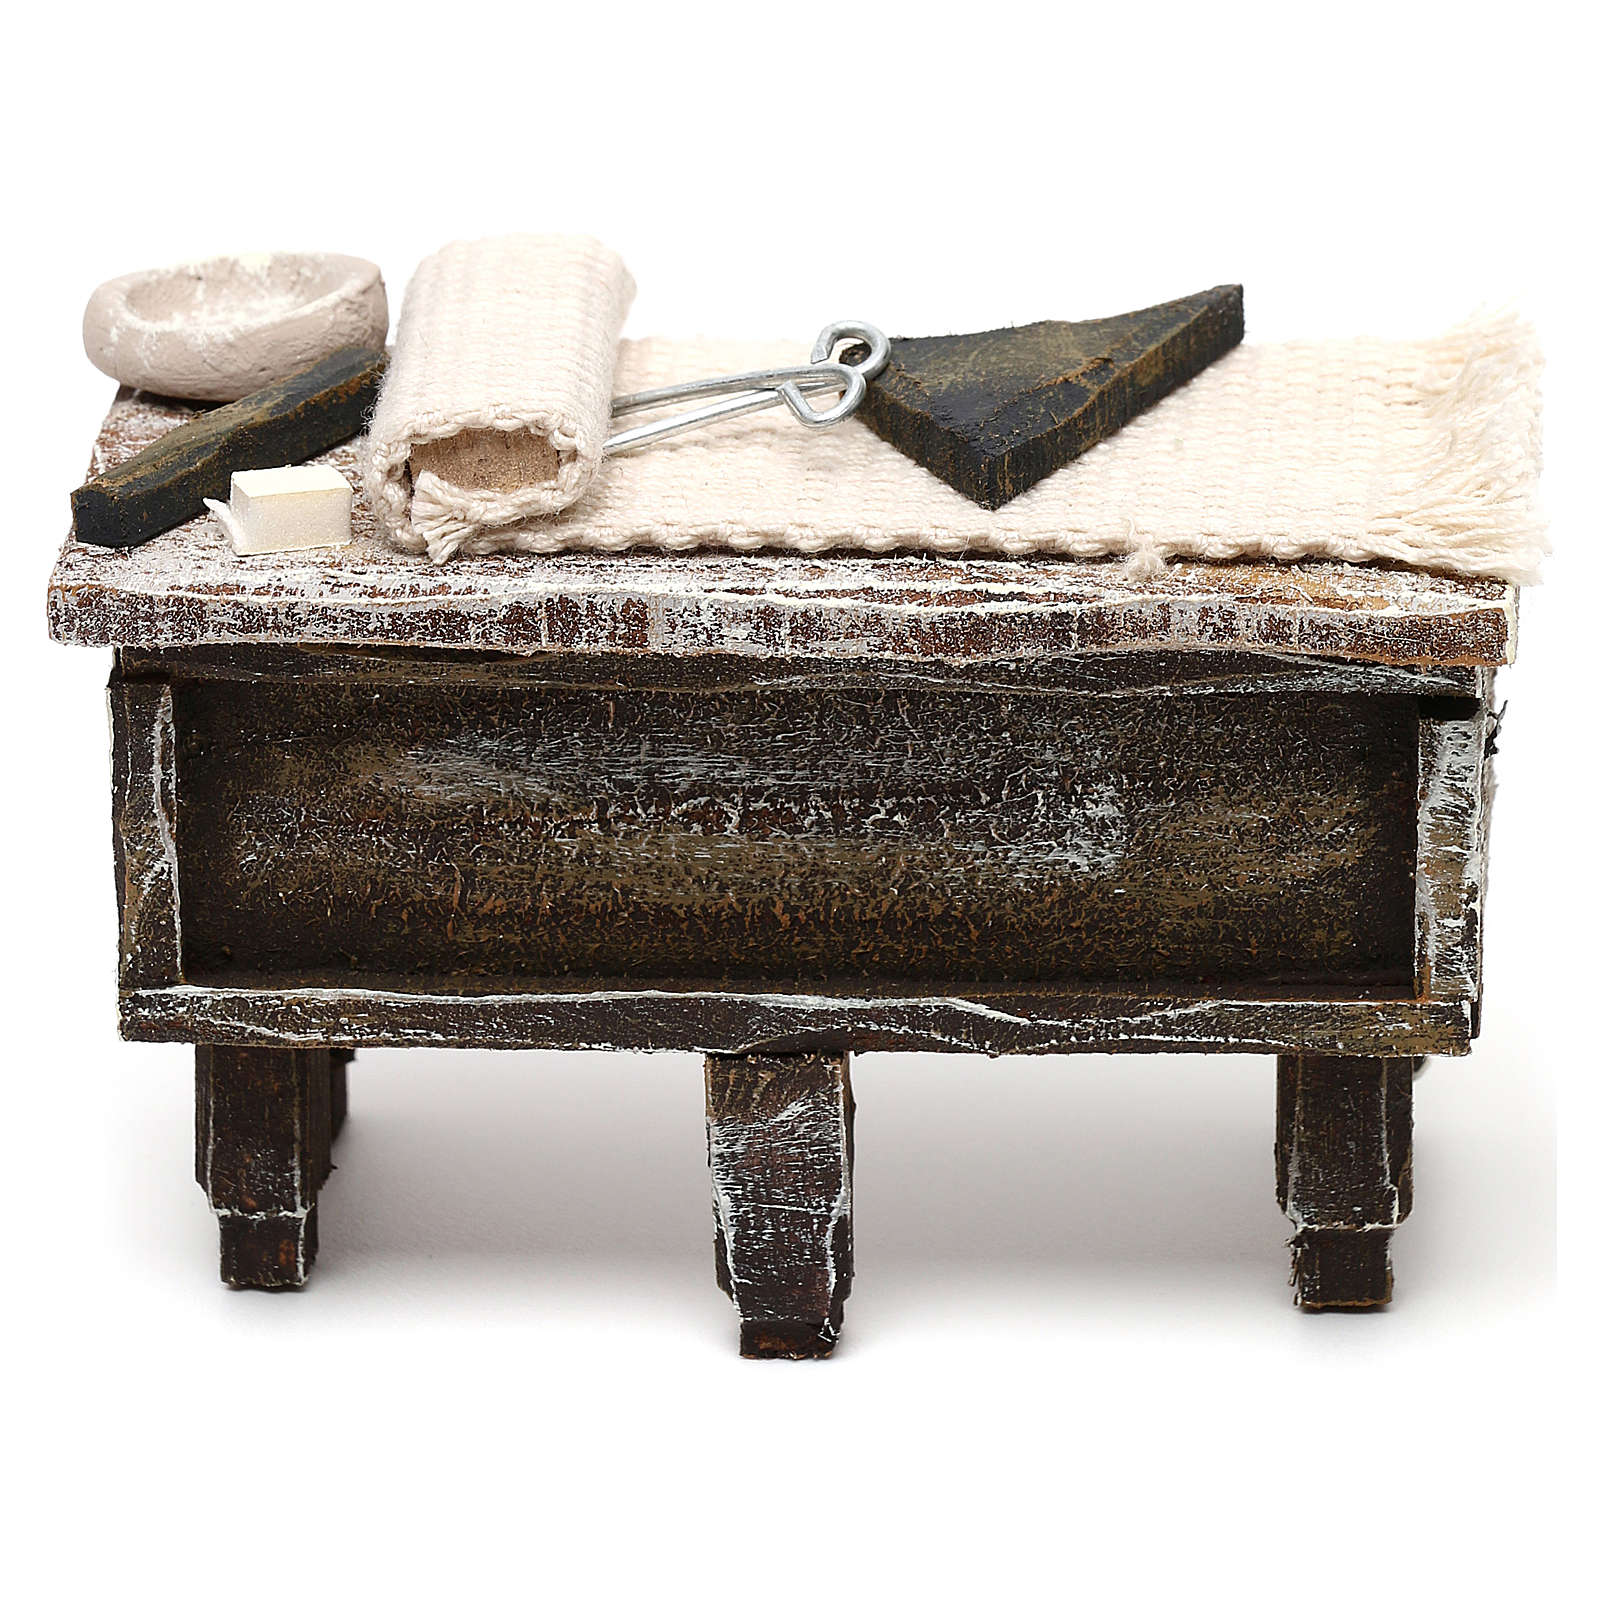 Tailor workbench in resin Nativity scene 12 cm 5x10x5 cm 4